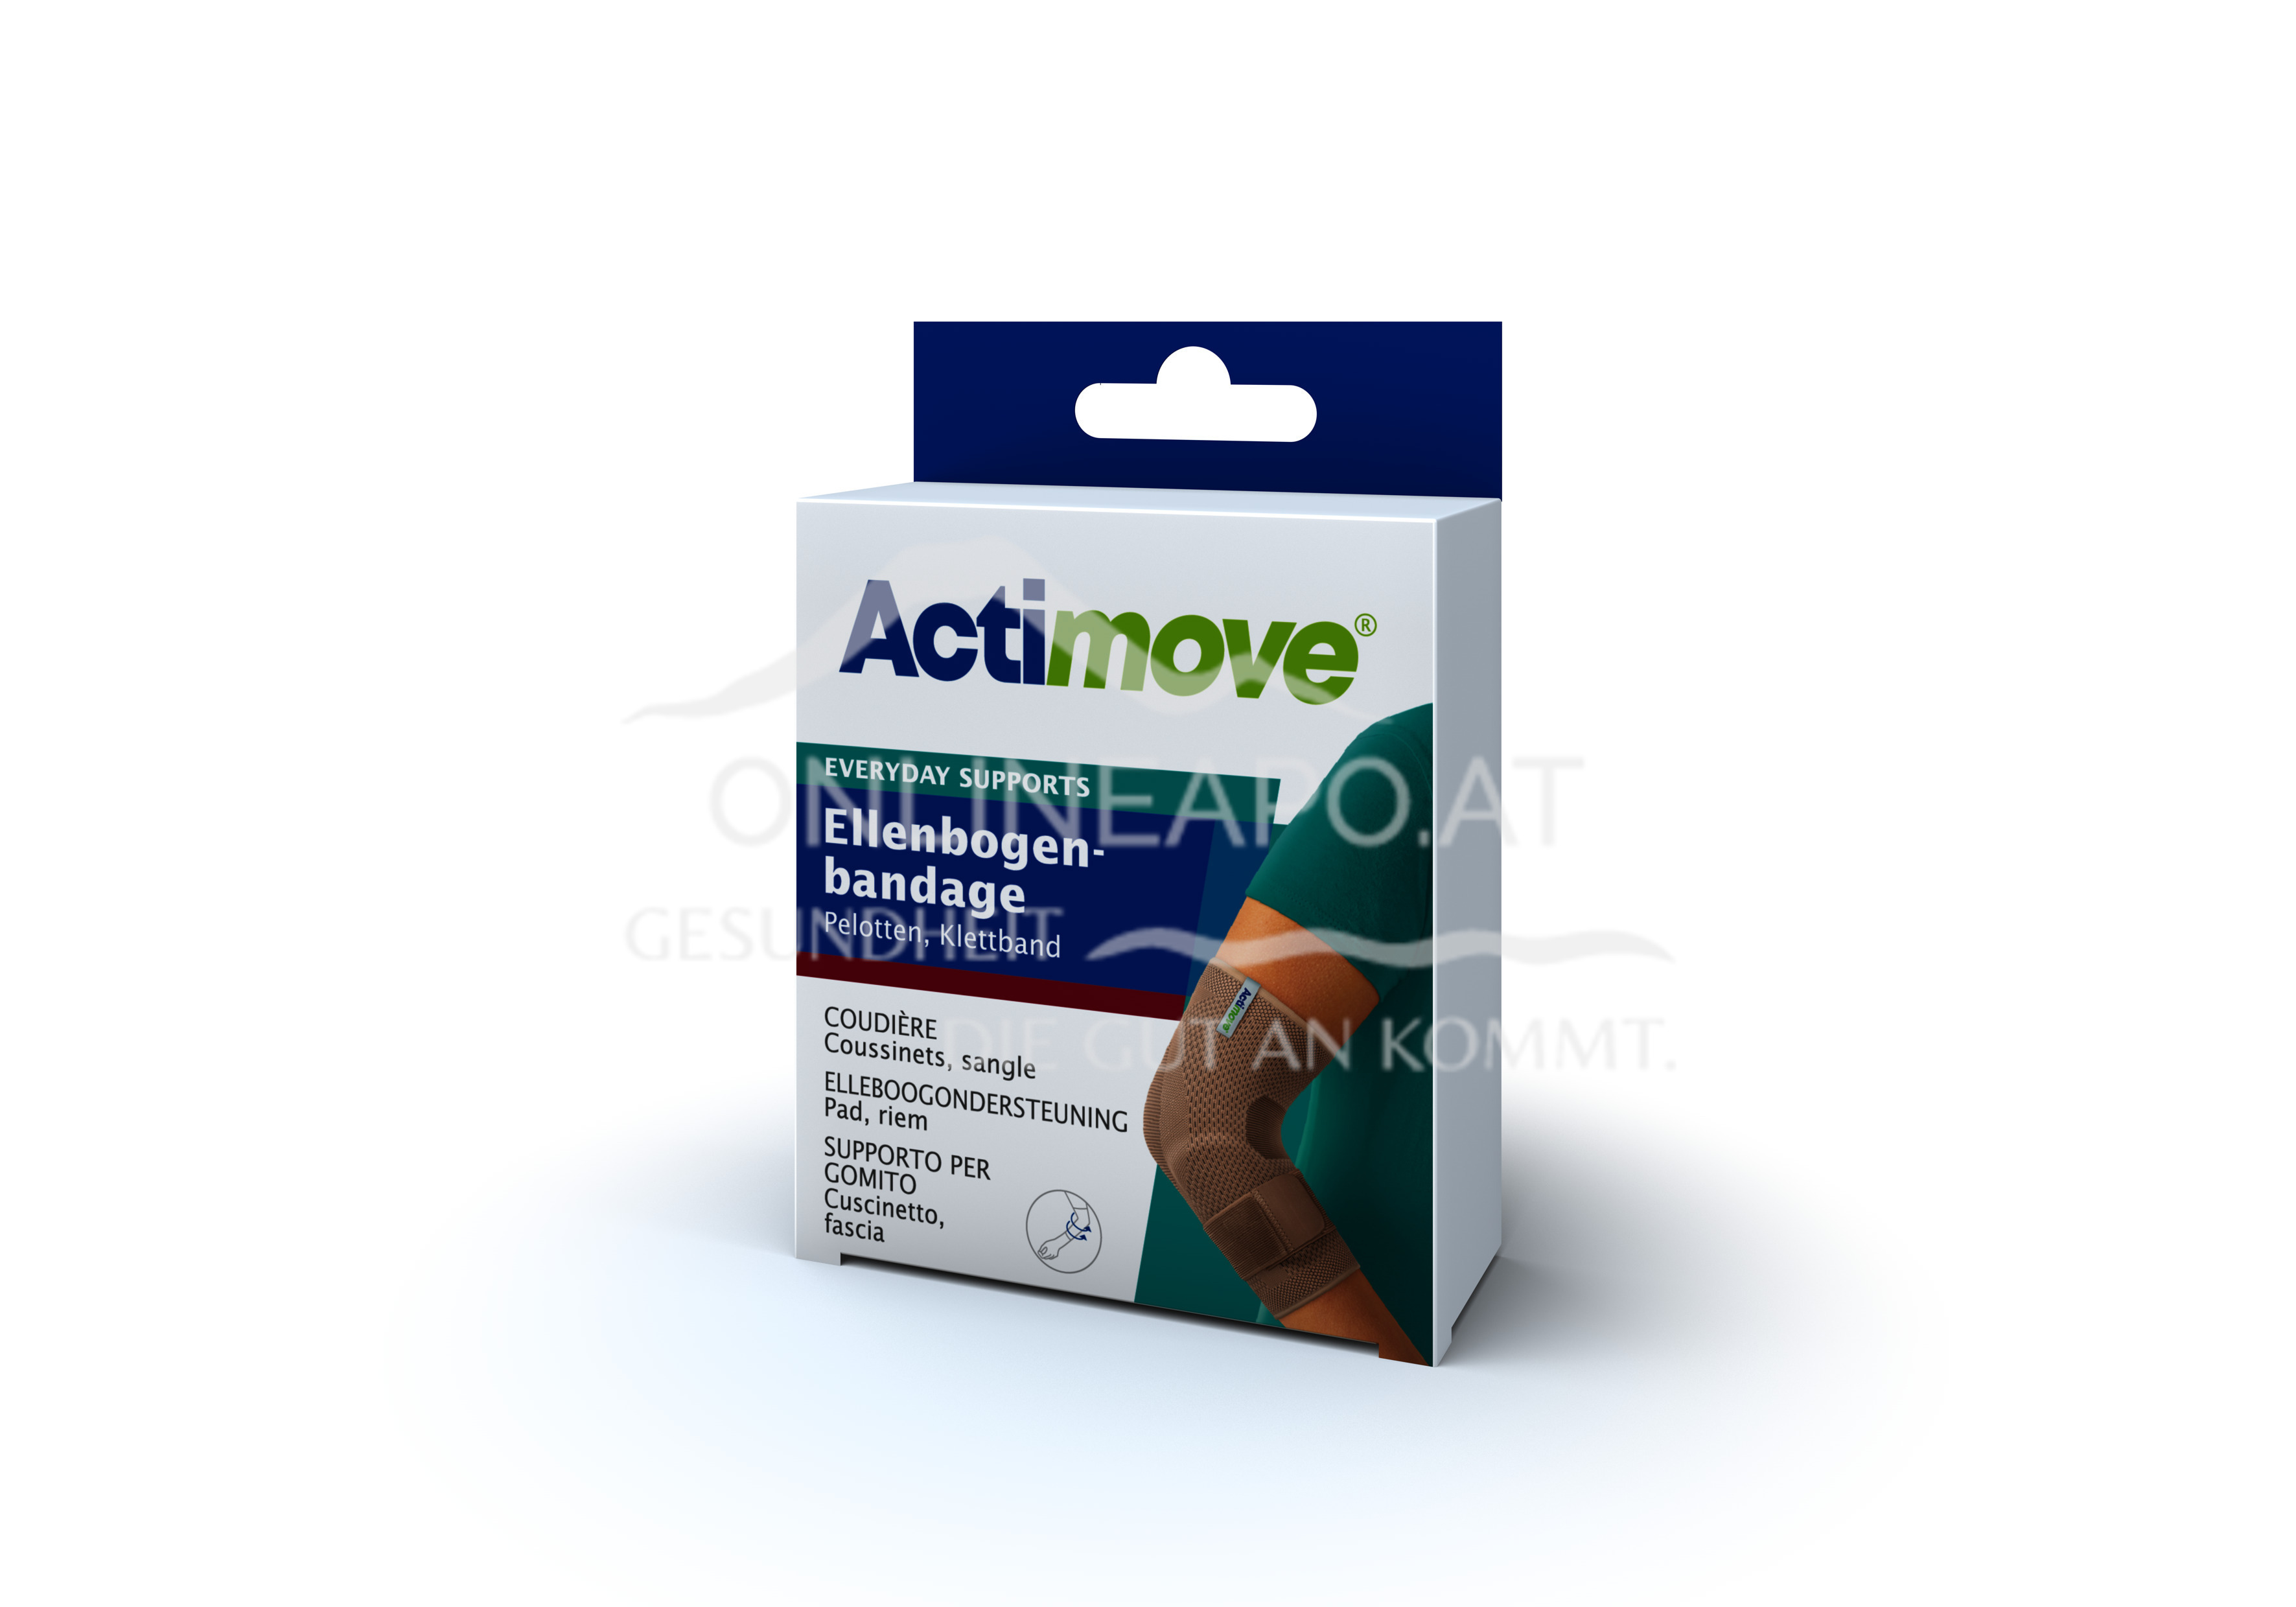 Actimove® Sport Edition Kniebandage Verstellbare hufeisenförmige Pelotte Größe XL